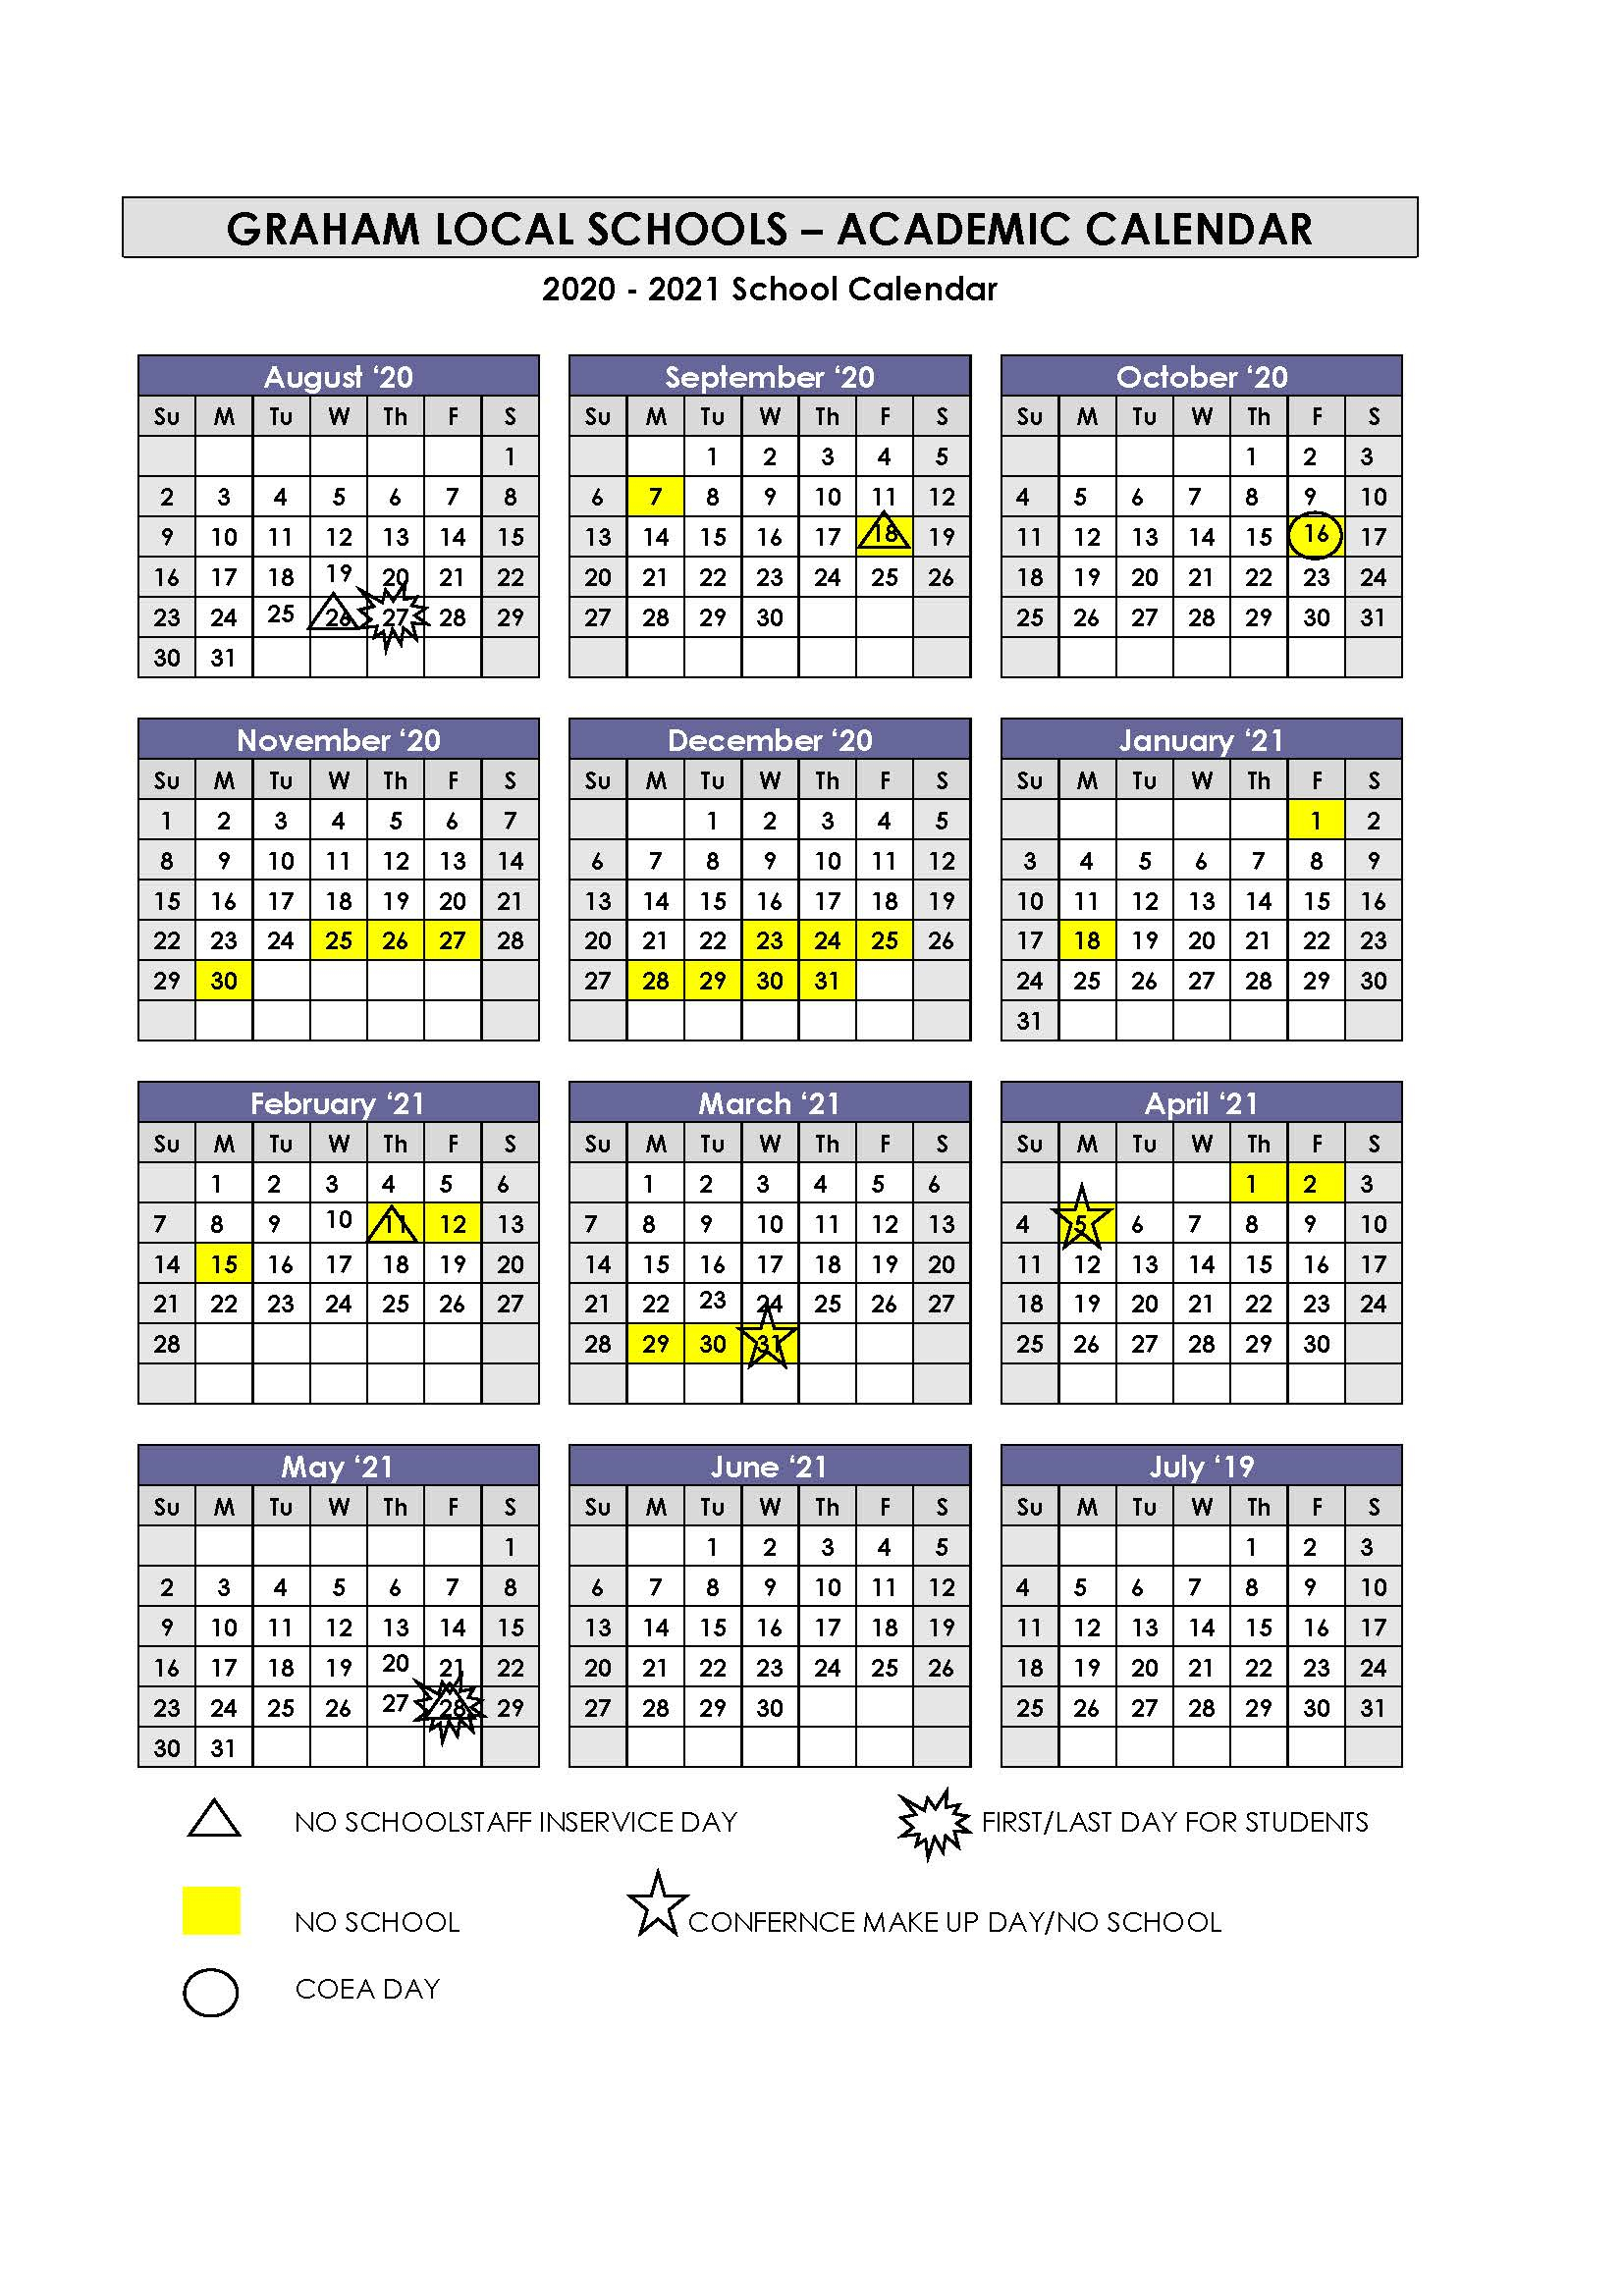 Calendar Intended For University Of Findlay Academic Calendar 2021